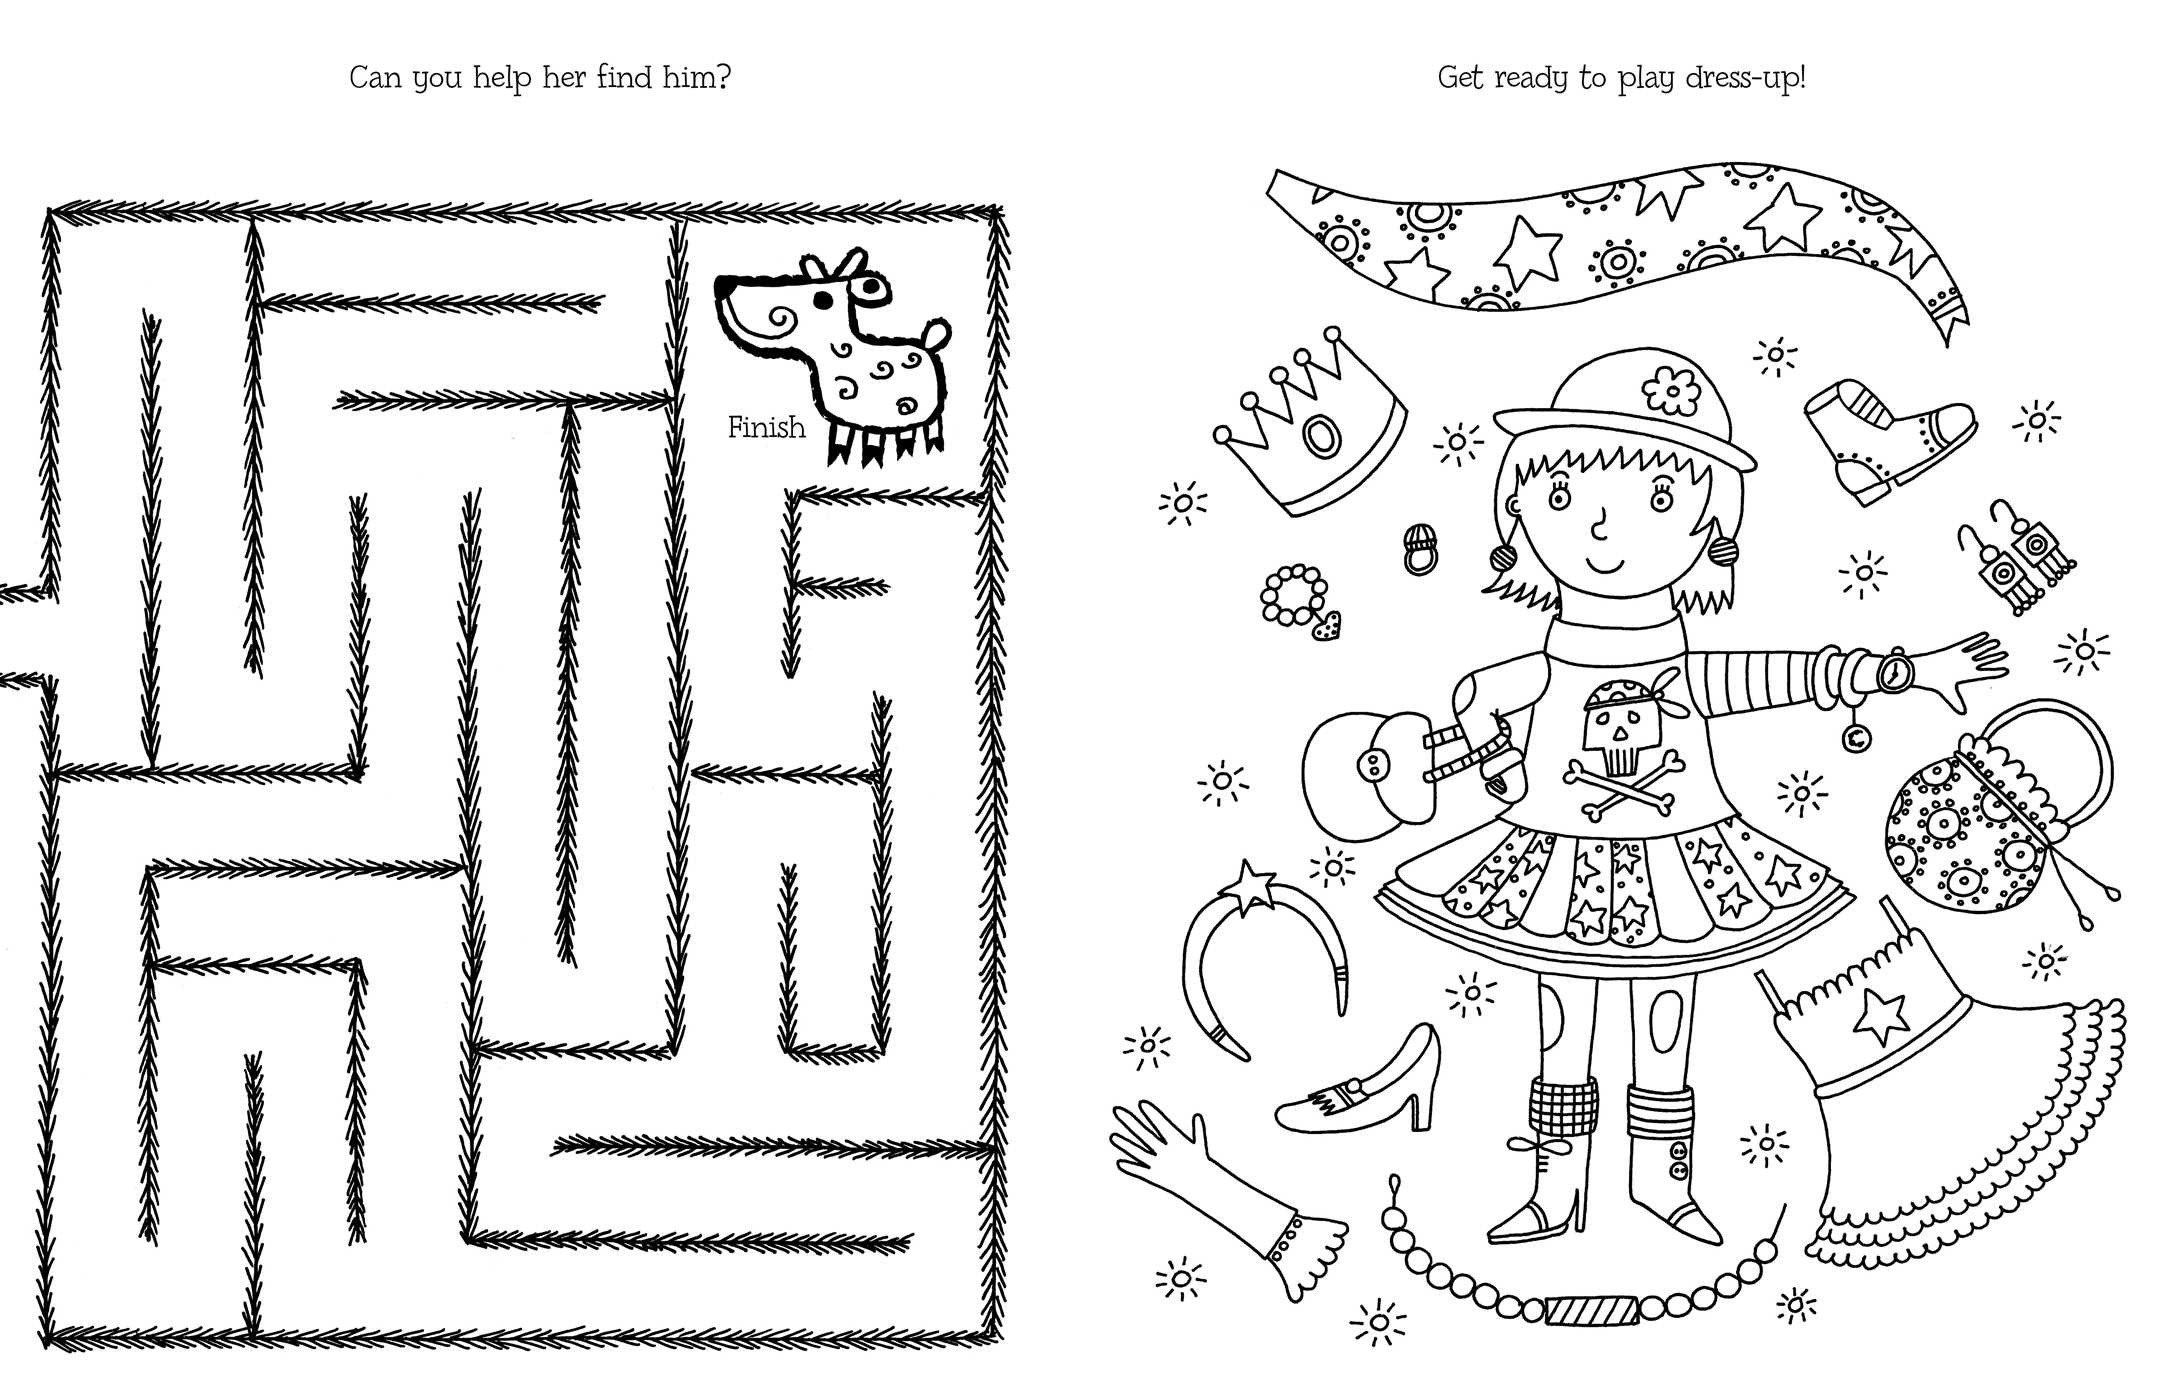 Dream doodle draw make believe magic 9781481462914.in05